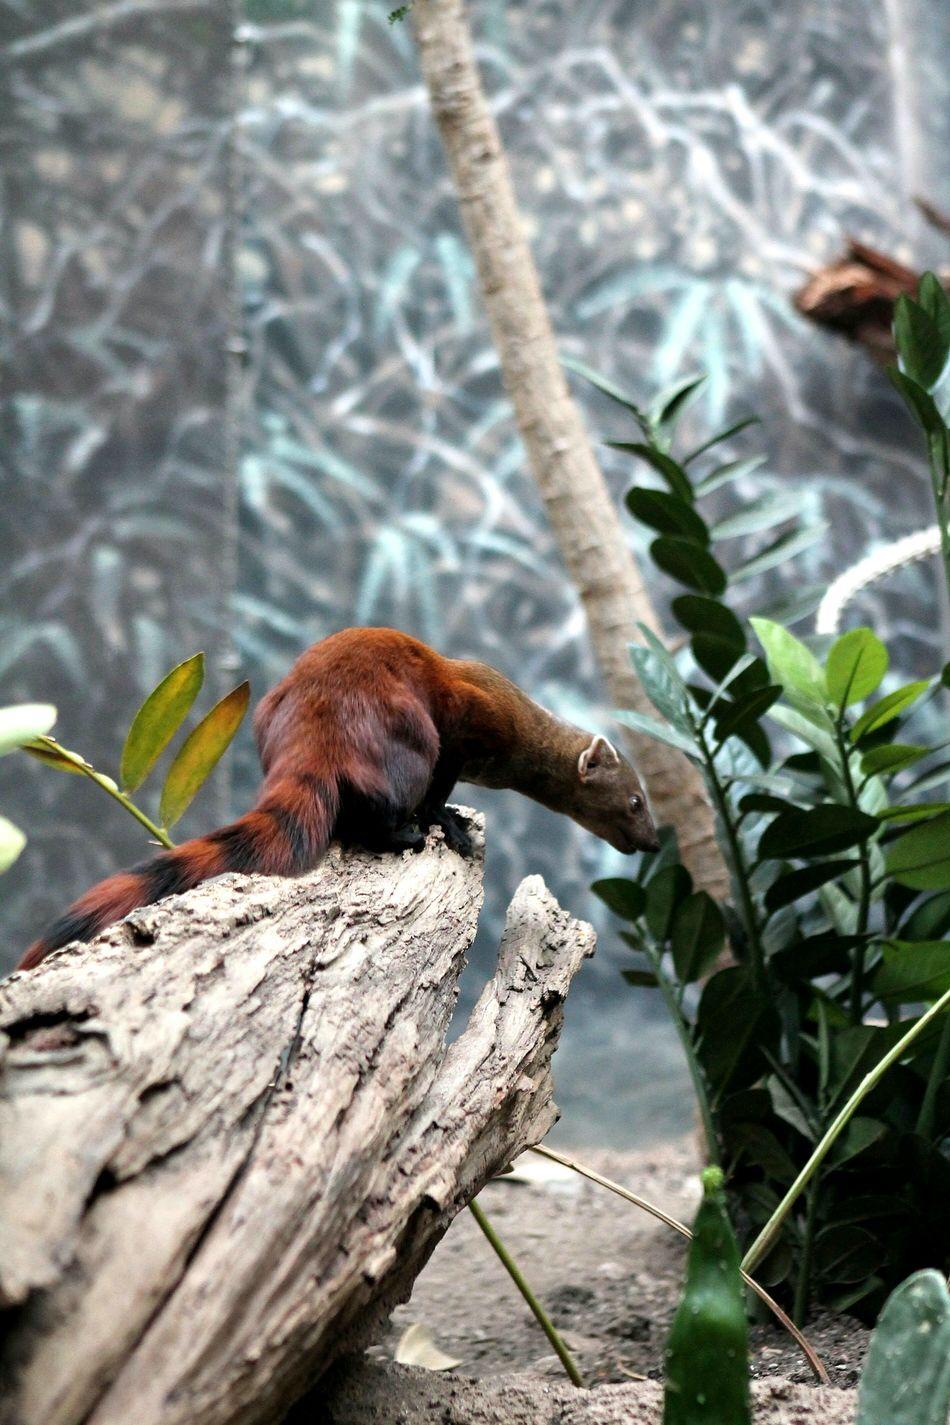 Fire Ferret Mammel Zoo Animal Rodent Log